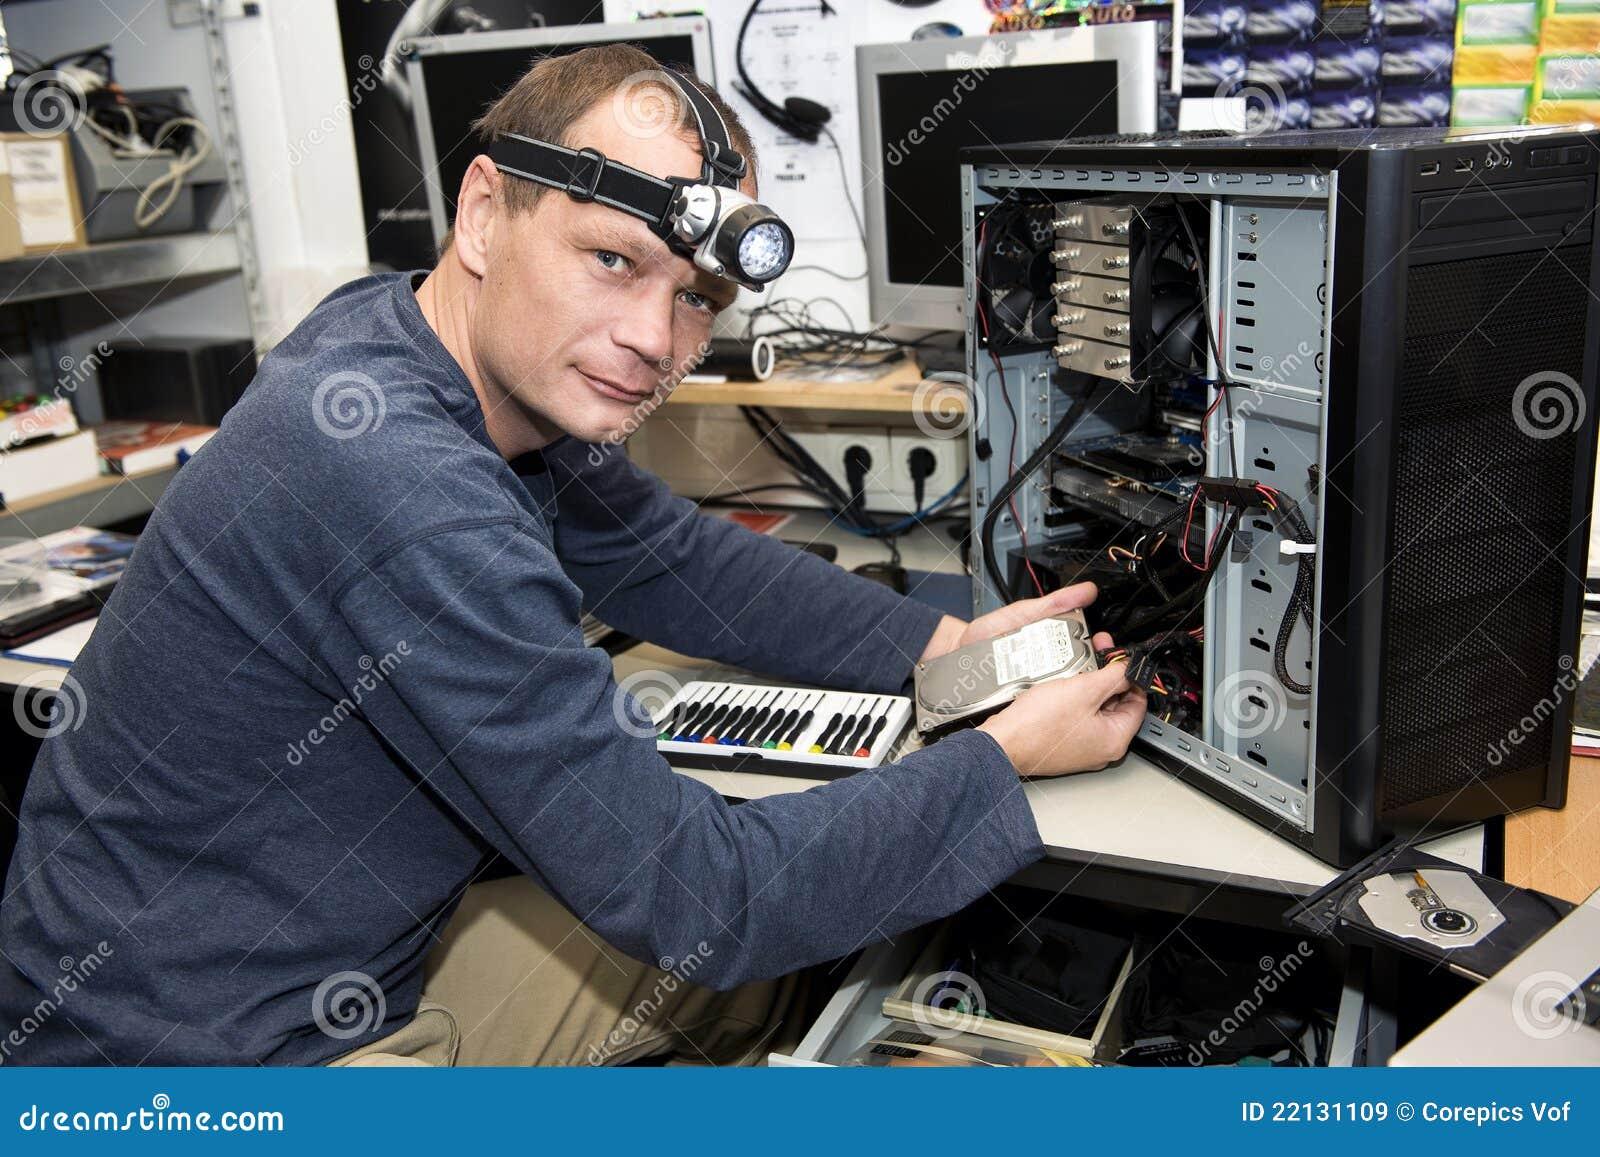 Computer Repair Shop Royalty Free Stock Images